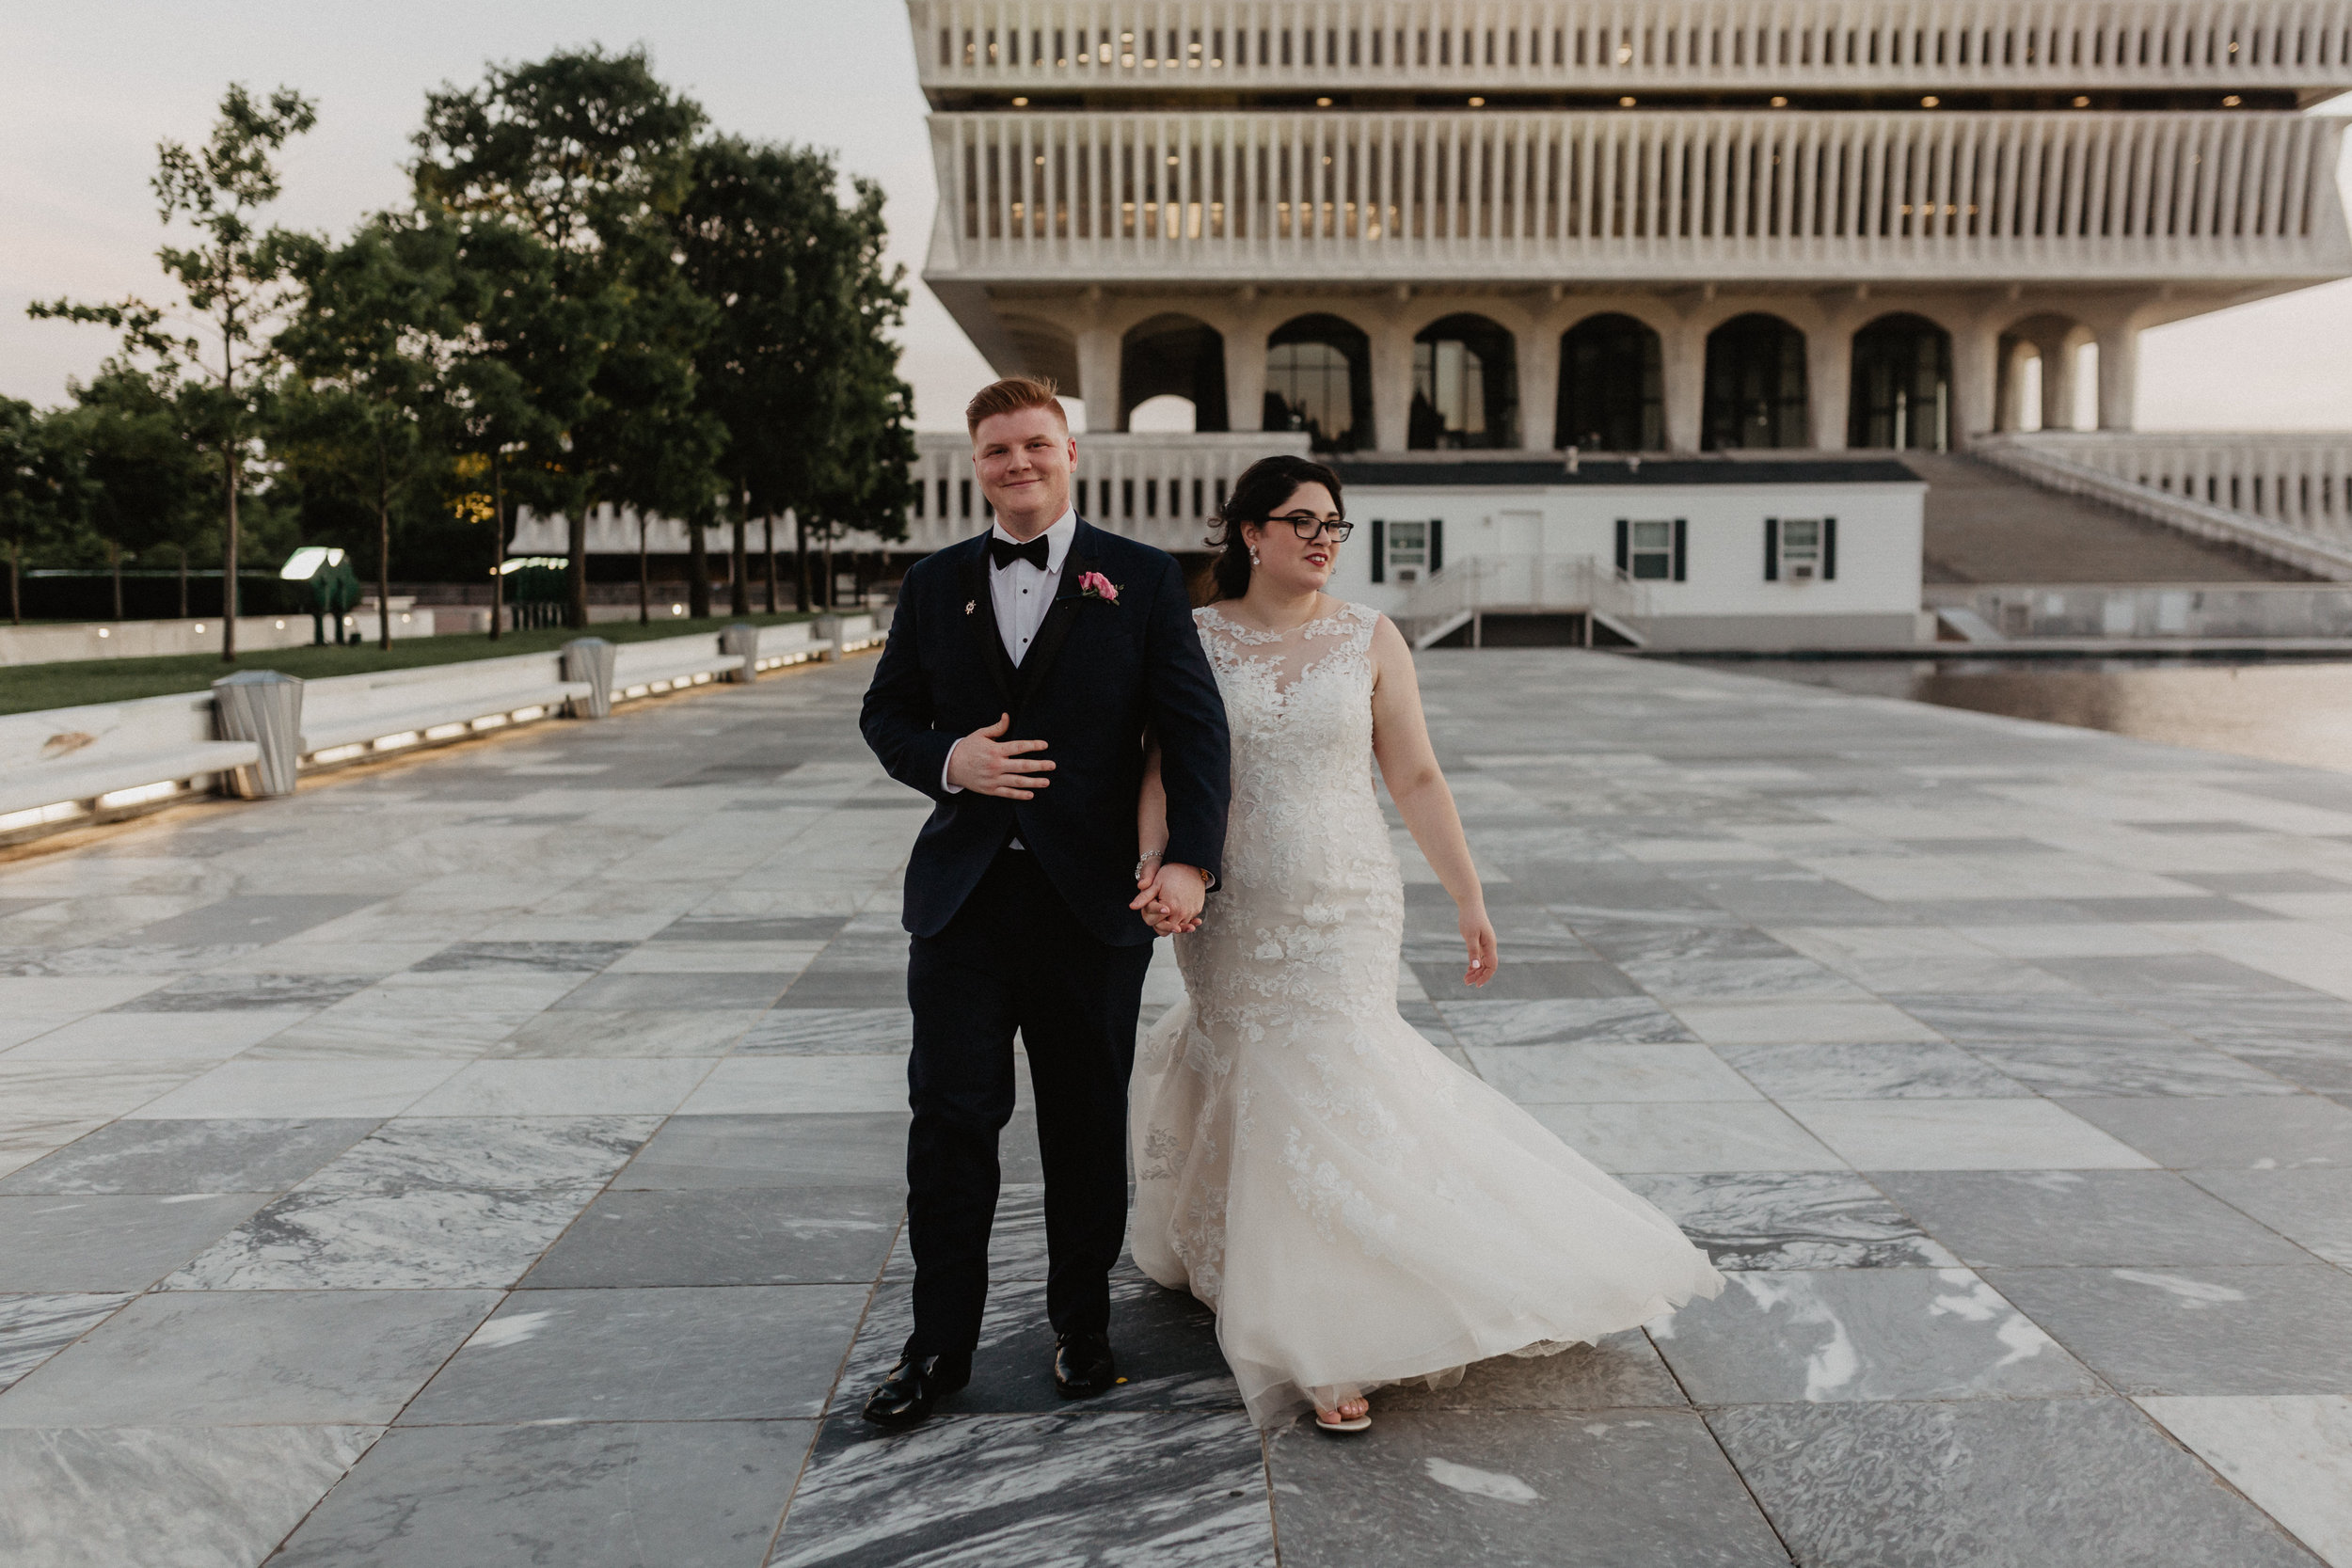 albany-new-york-wedding-73.jpg